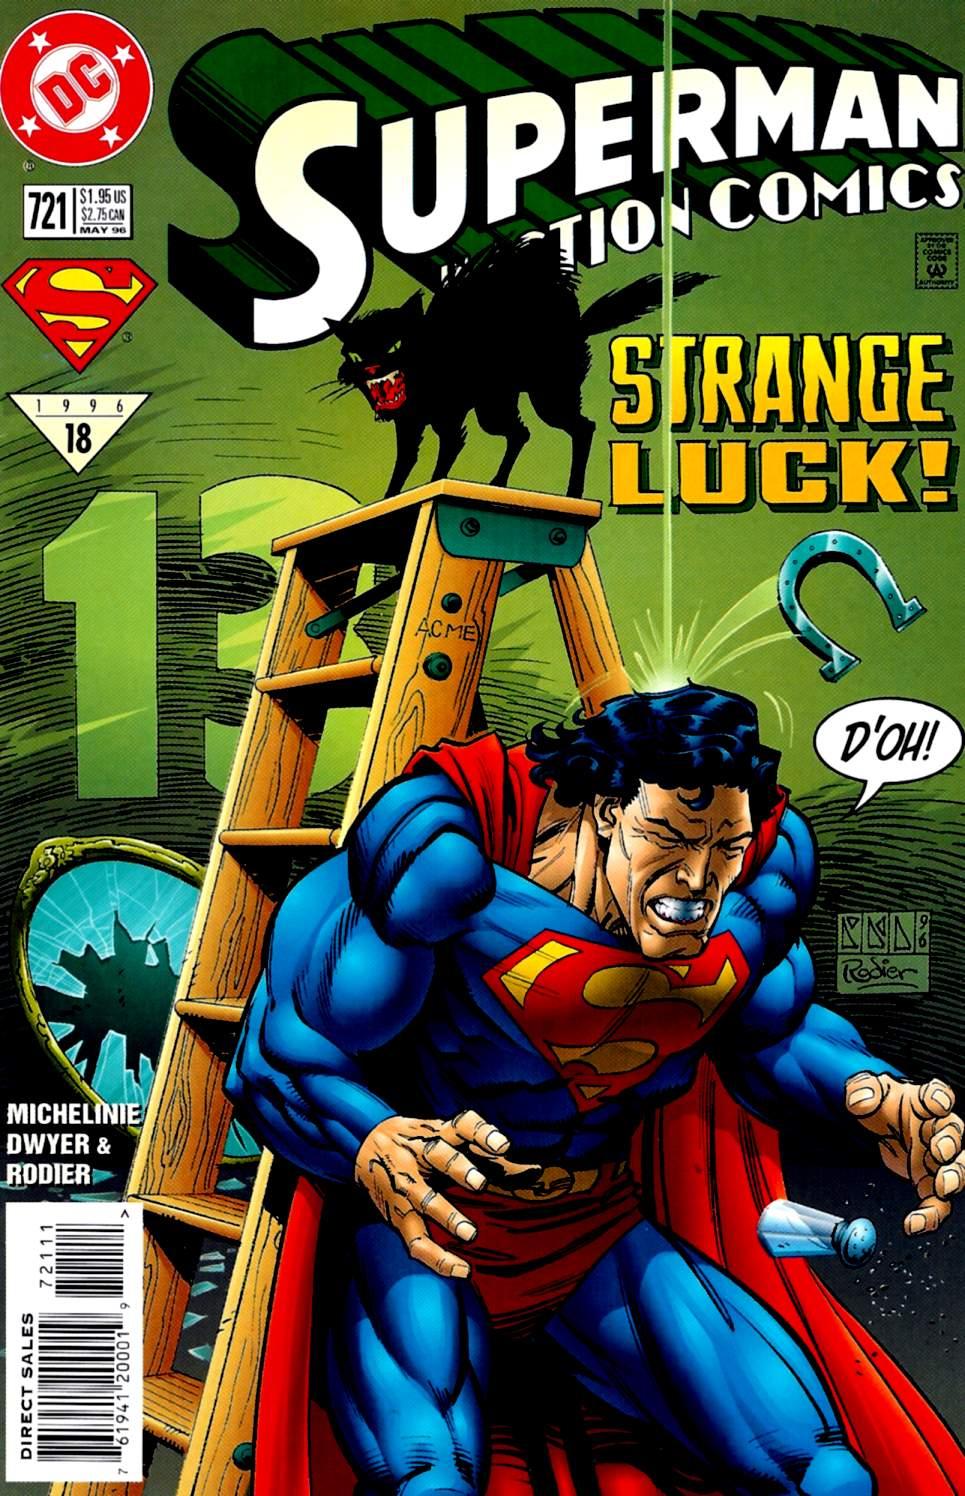 Action Comics (1938) 721 Page 1